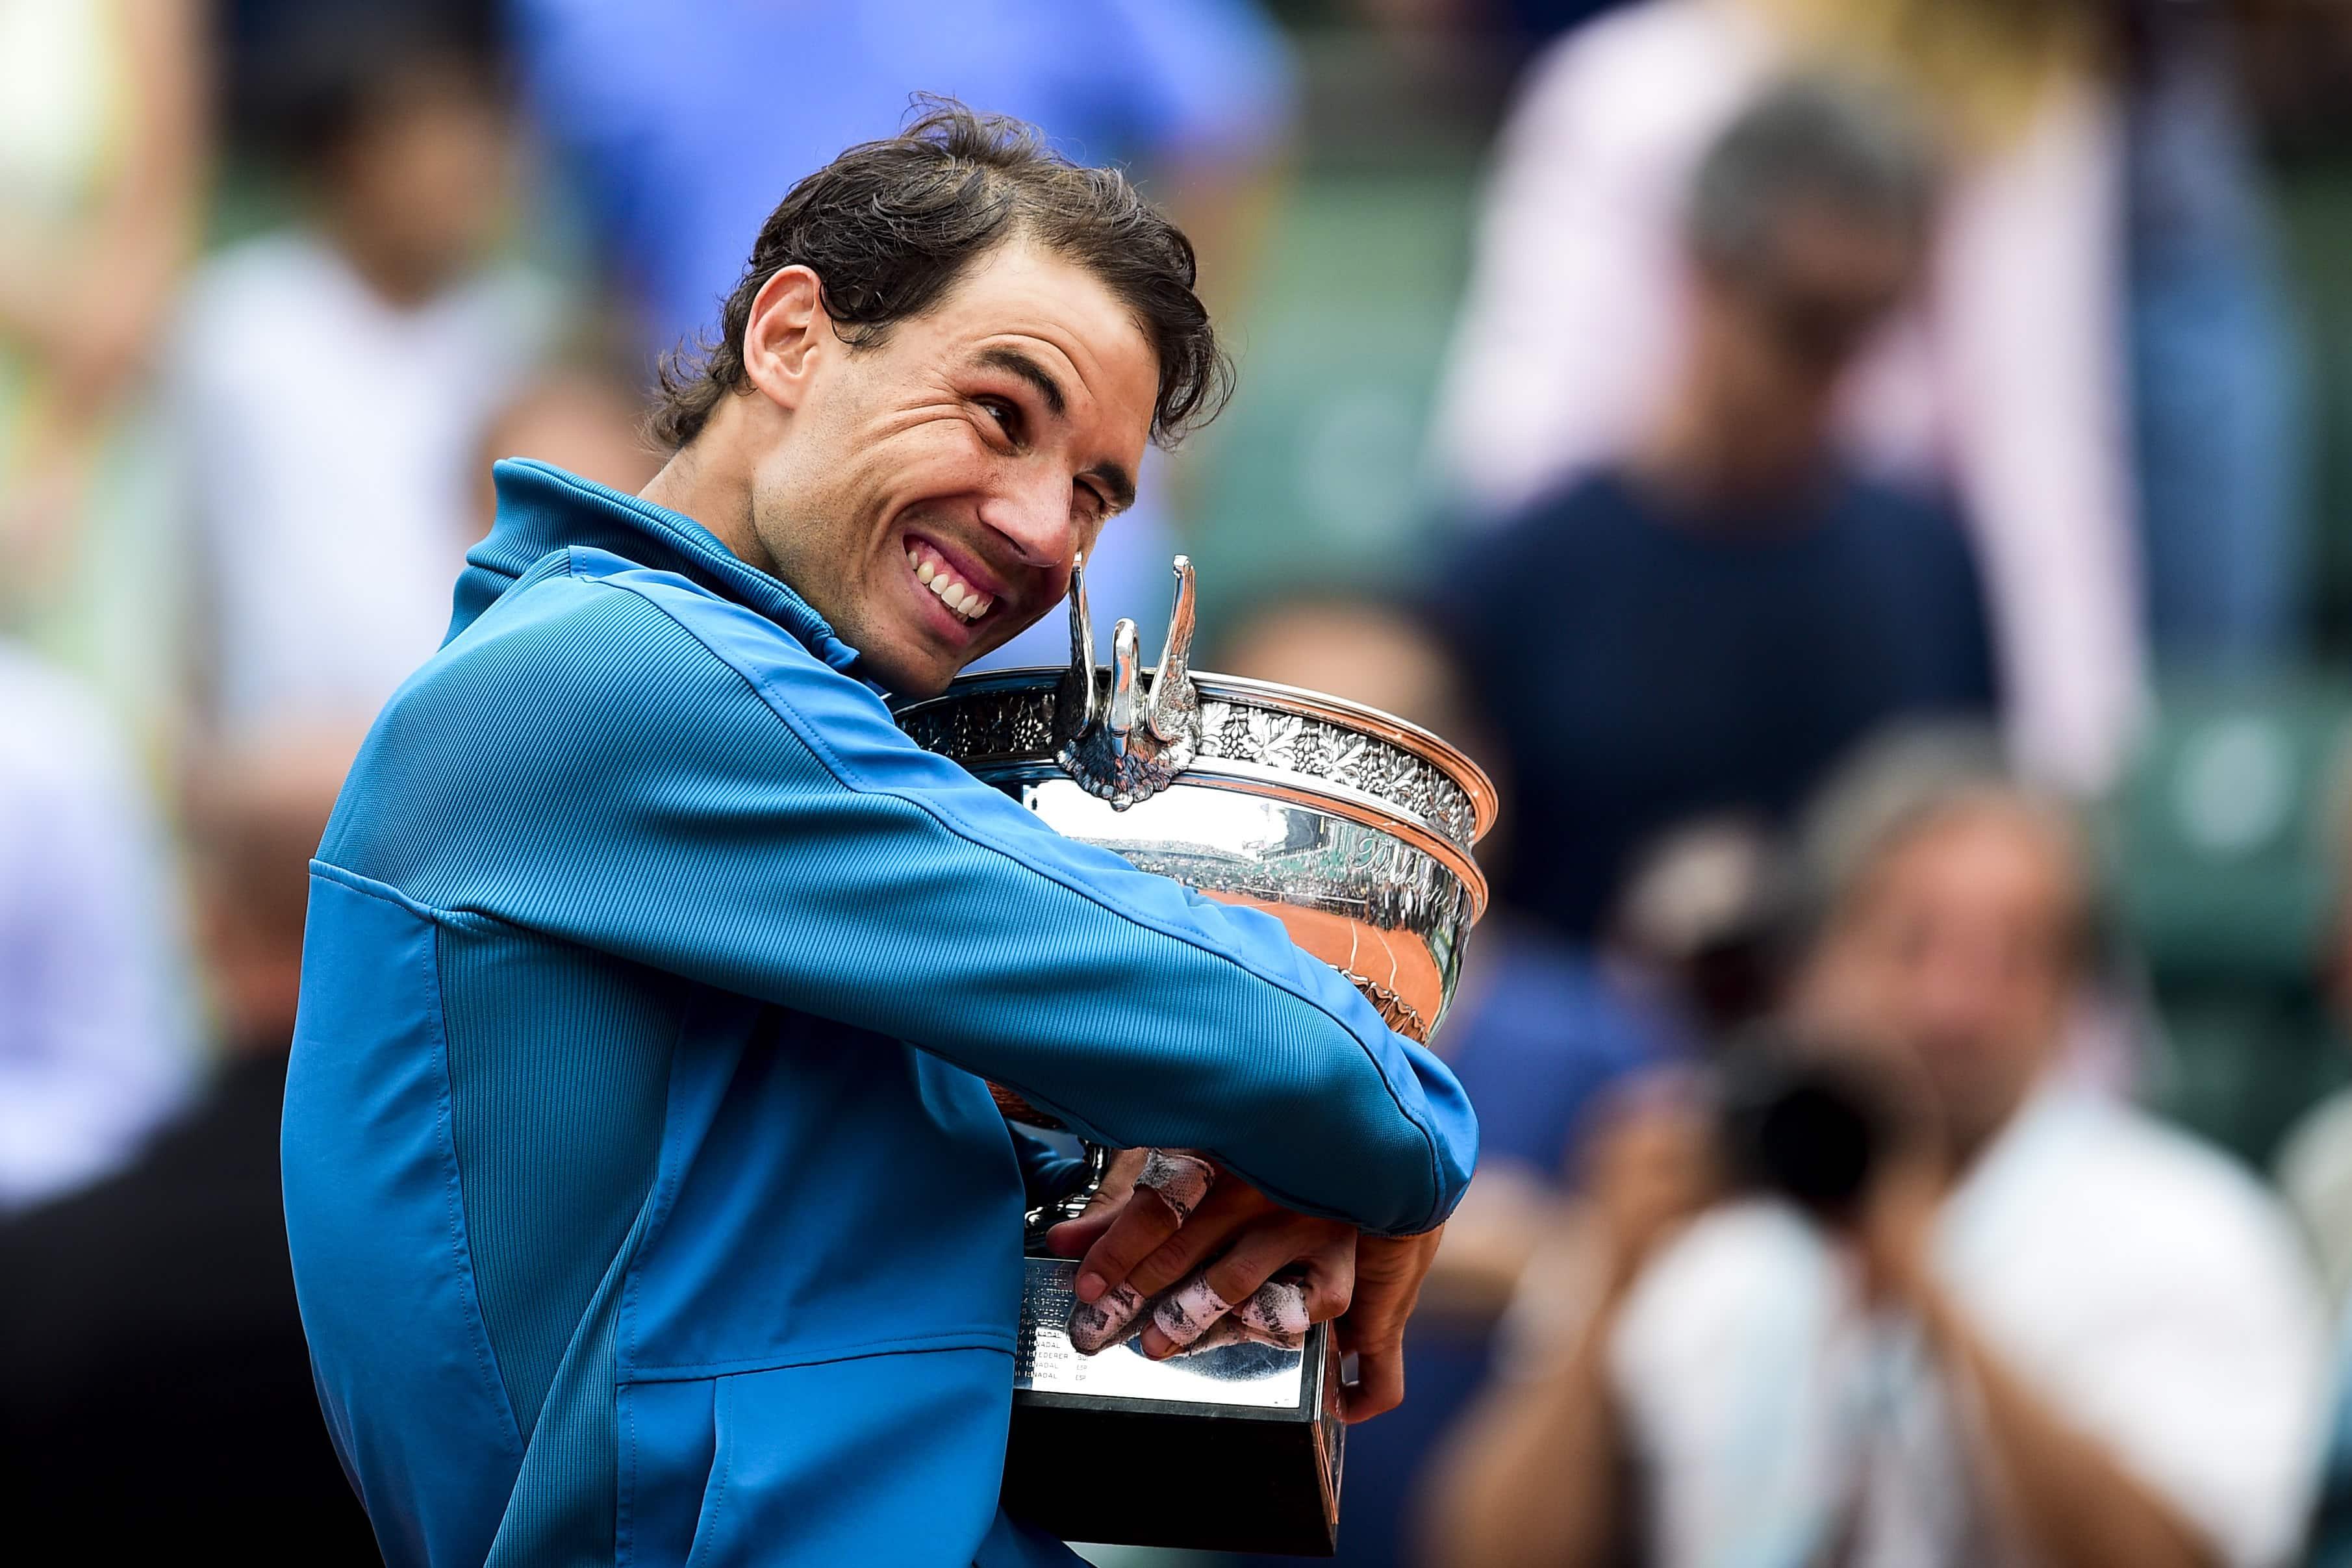 Calendario Tornei Atp 2020.Calendario Tennis Atp 2019 Date Tornei Slam E Masters 1000